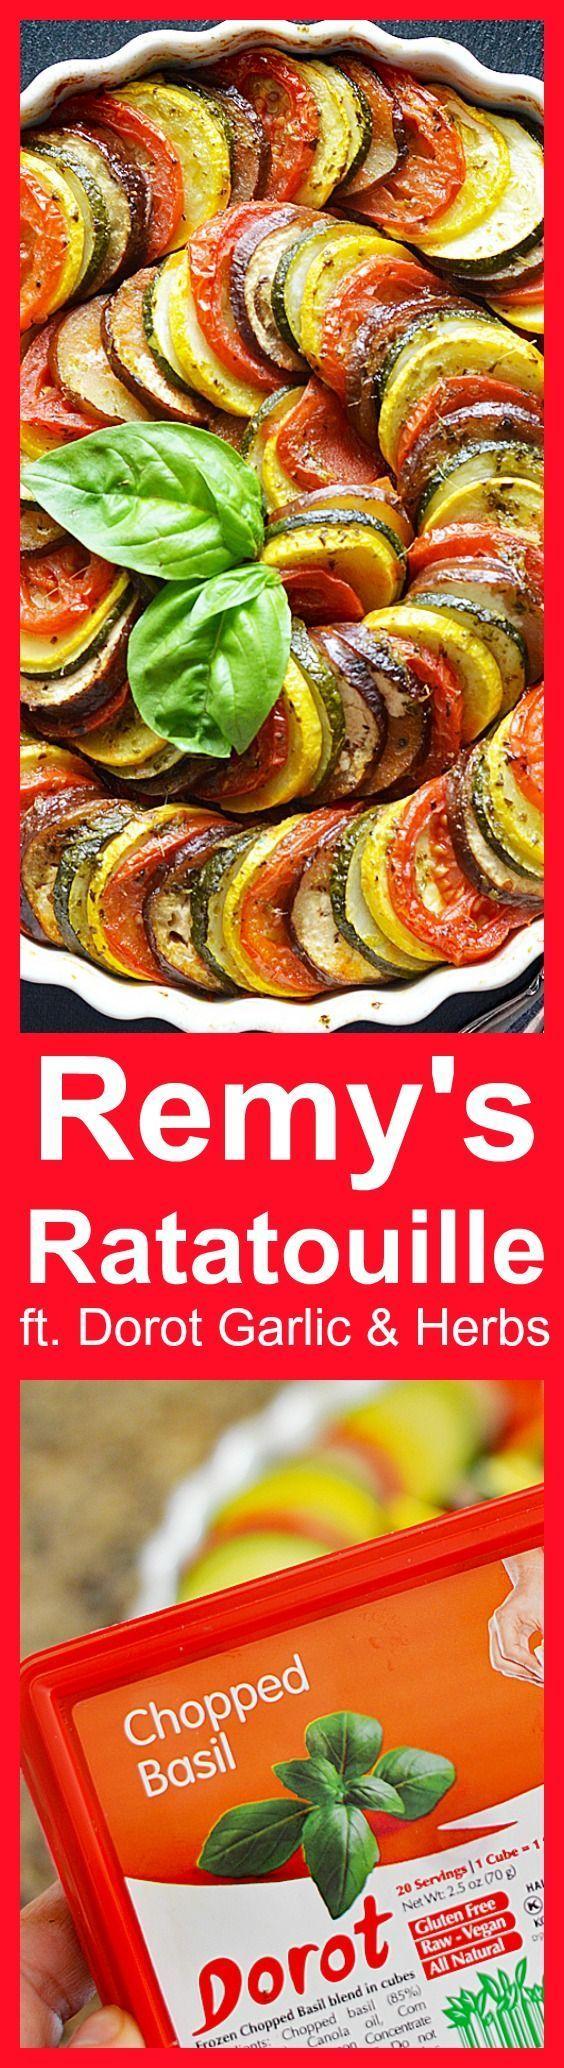 Remy's Ratatouille featuring @MyDorot Garlic & Herbs #ElevateYourPlate #ad https://ooh.li/9ac3355